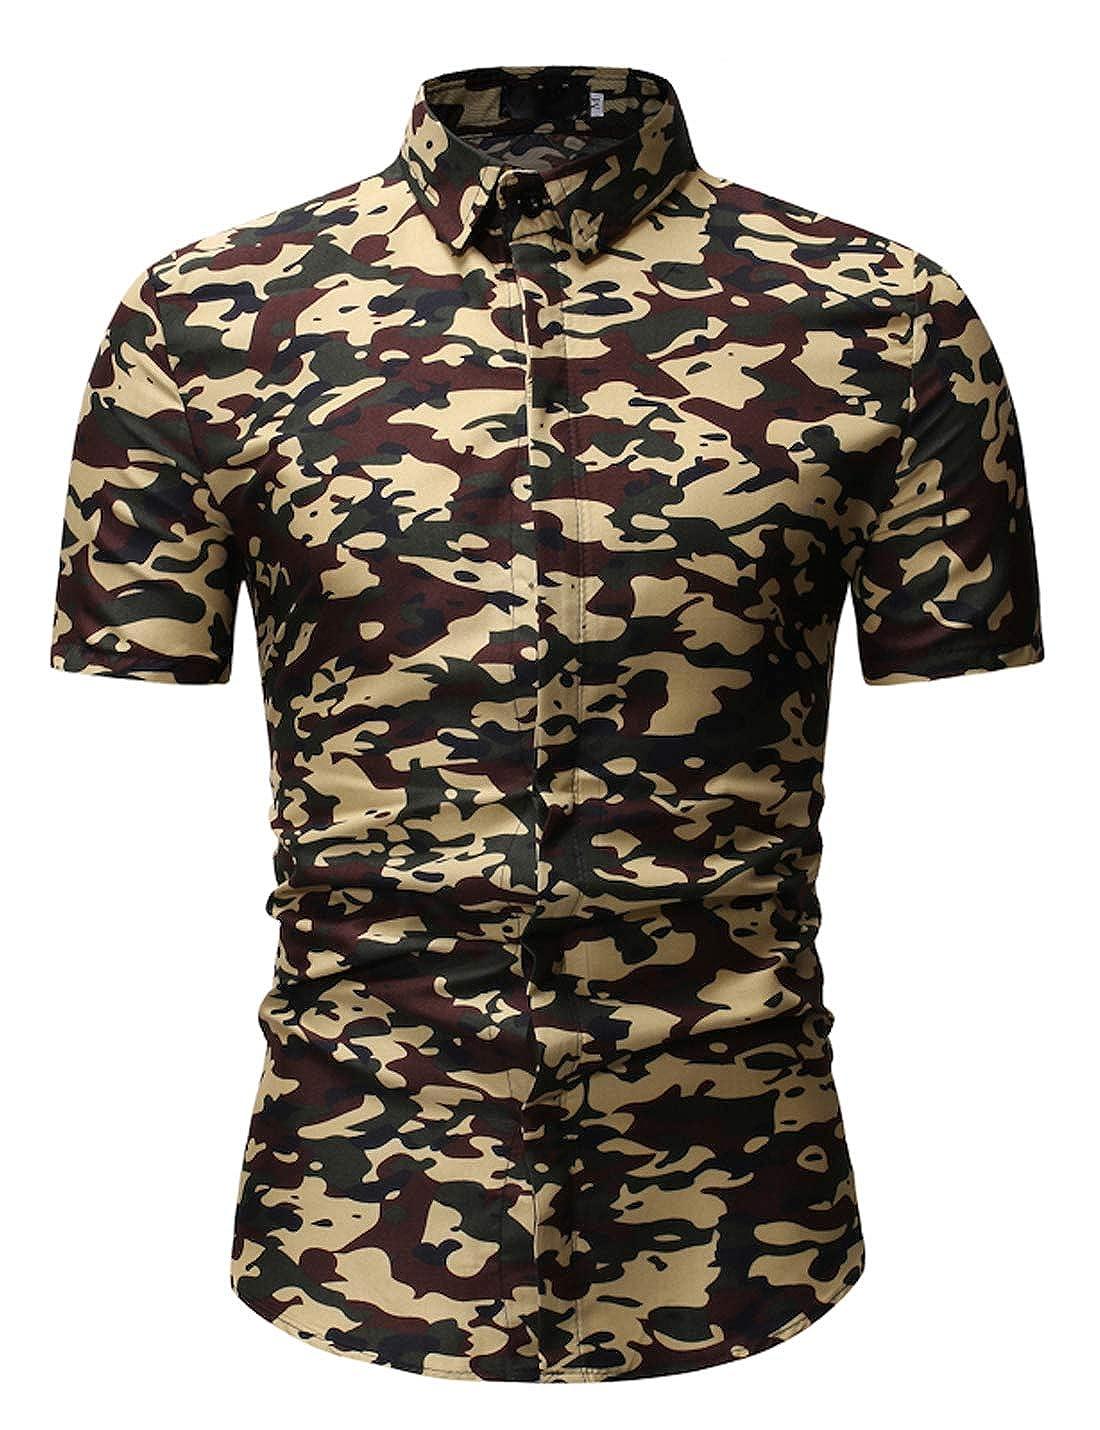 D.B.M Mens Casual Classic Lapel Short Sleeve Button Camouflage Shirt